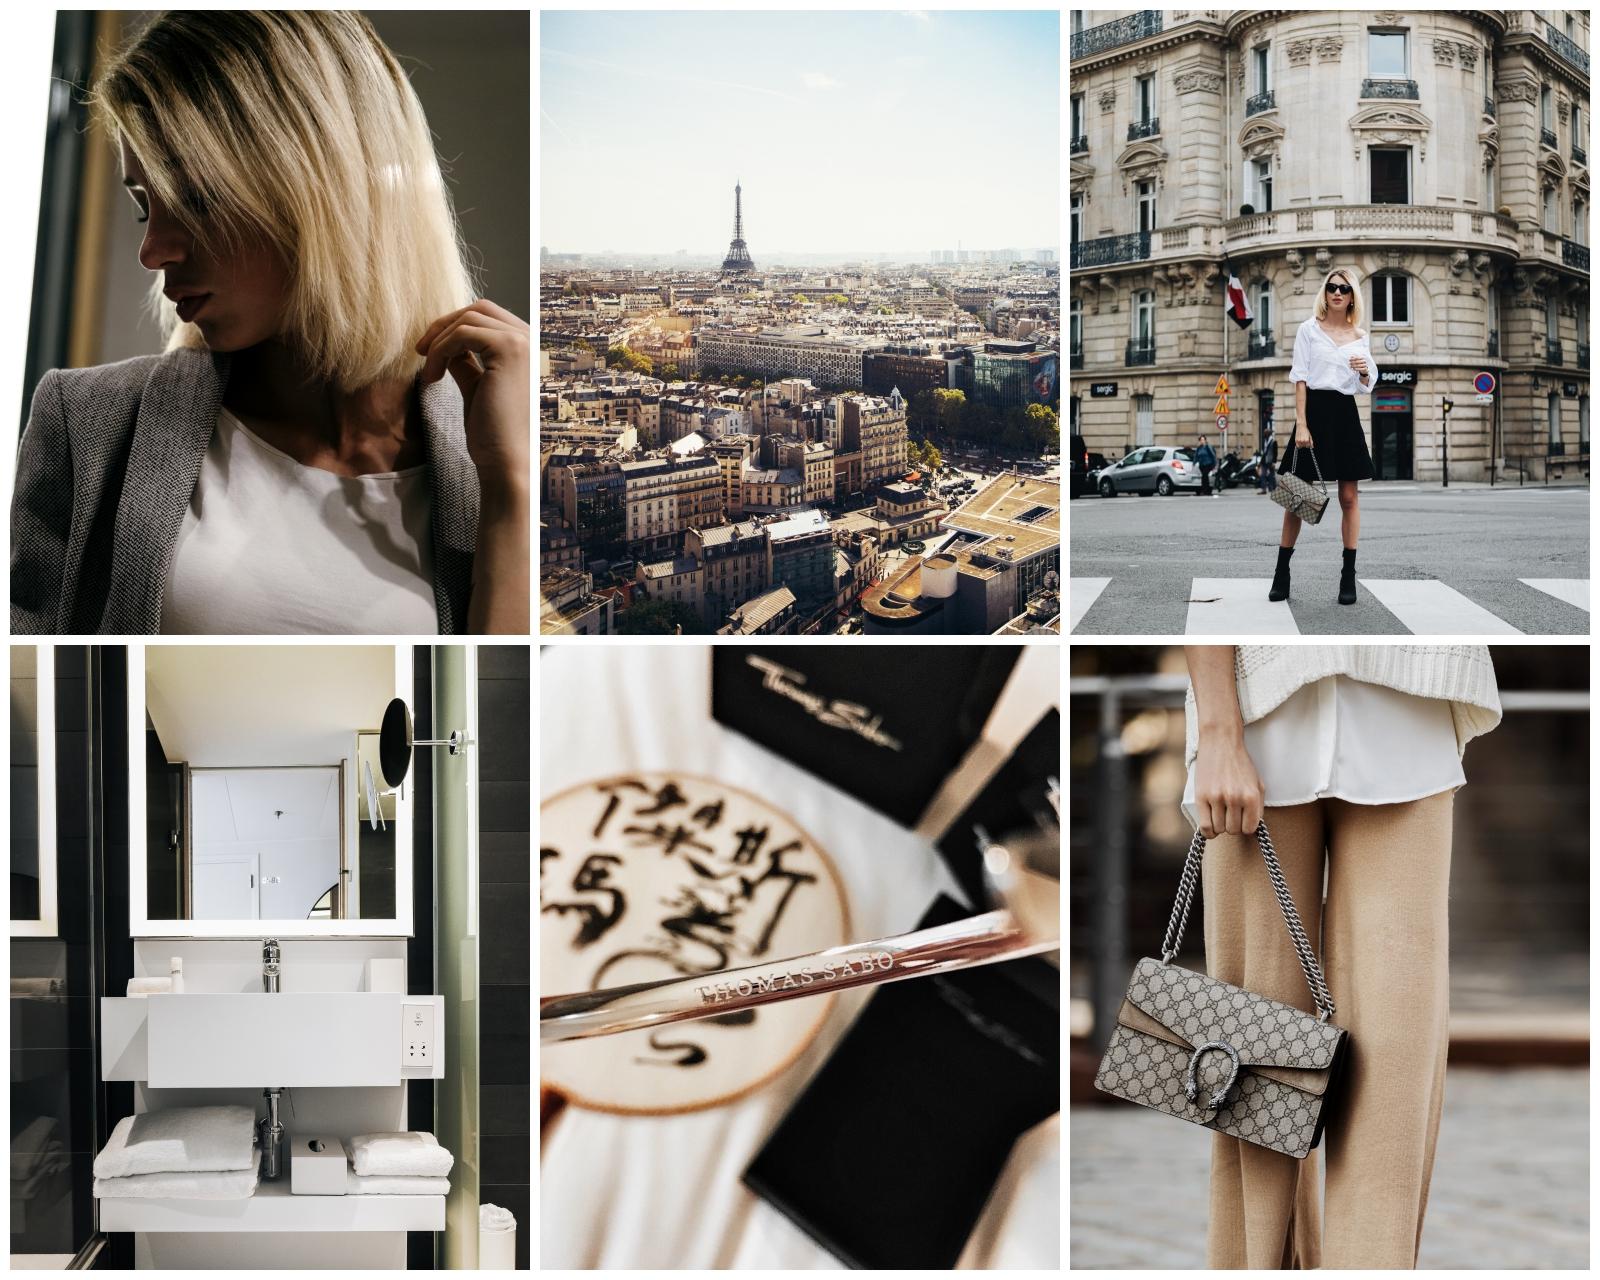 deutschfashionblogger-paris-fashionweek-2017.